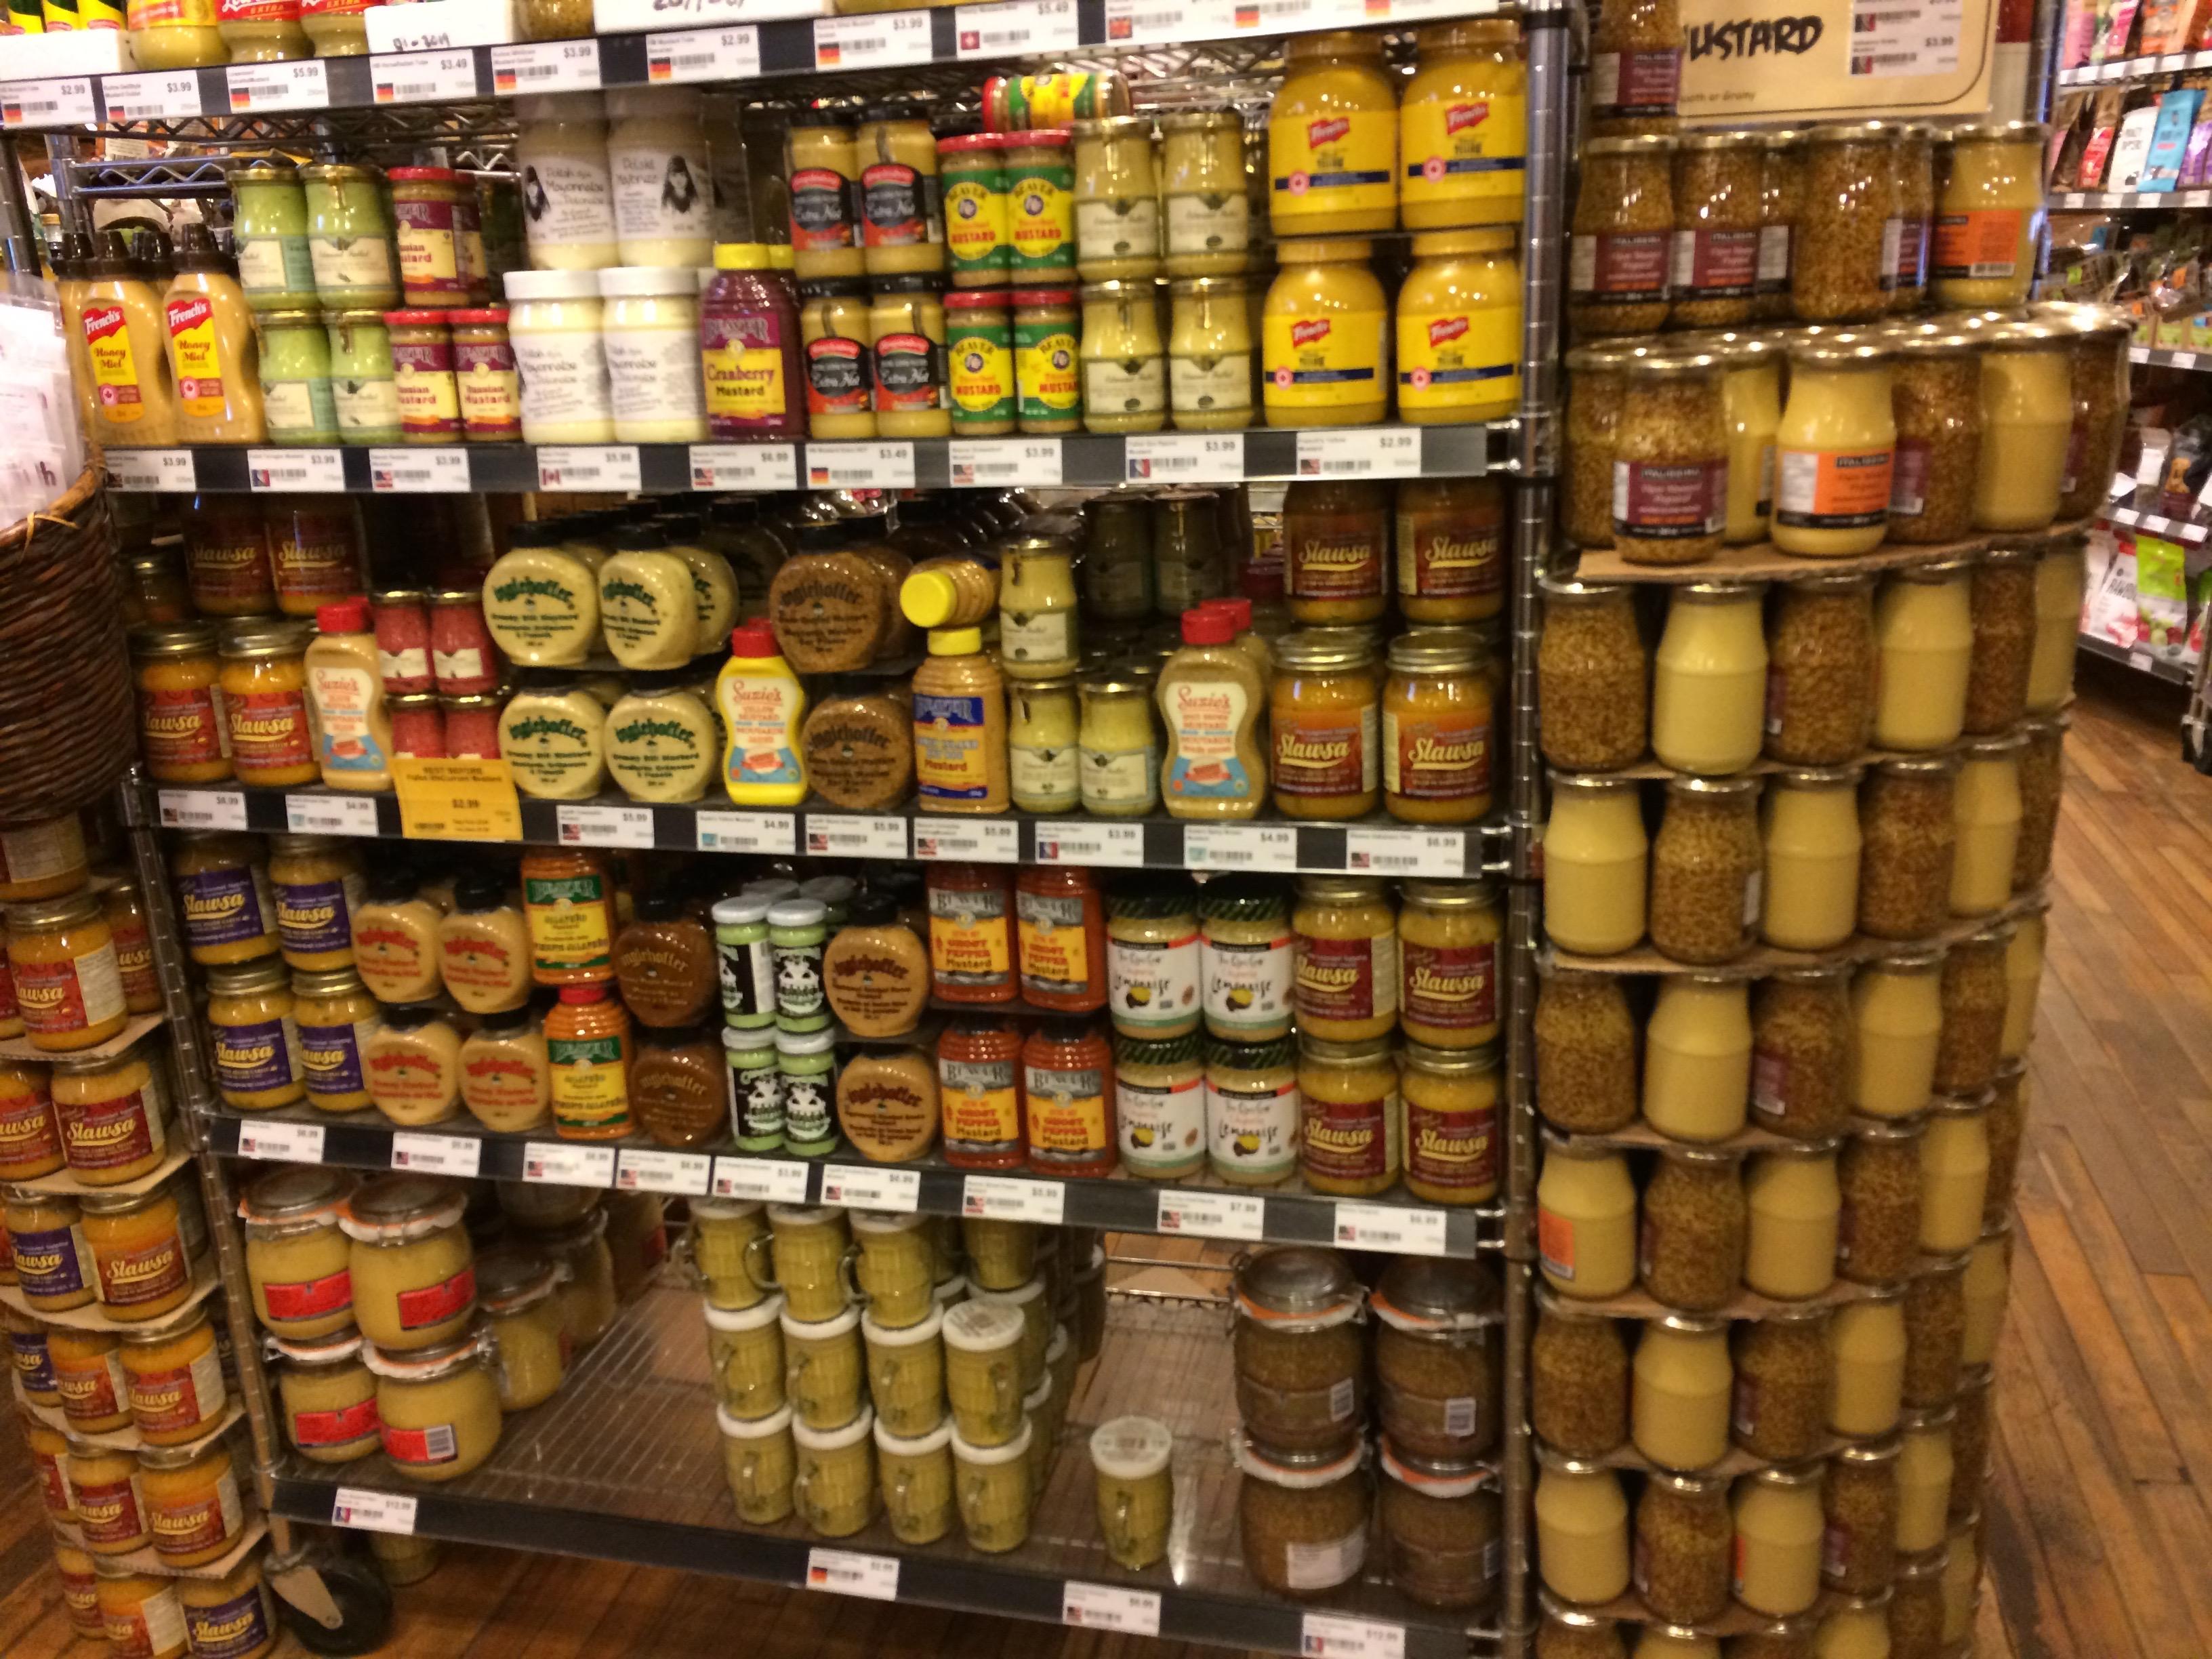 For the mustard afficionado